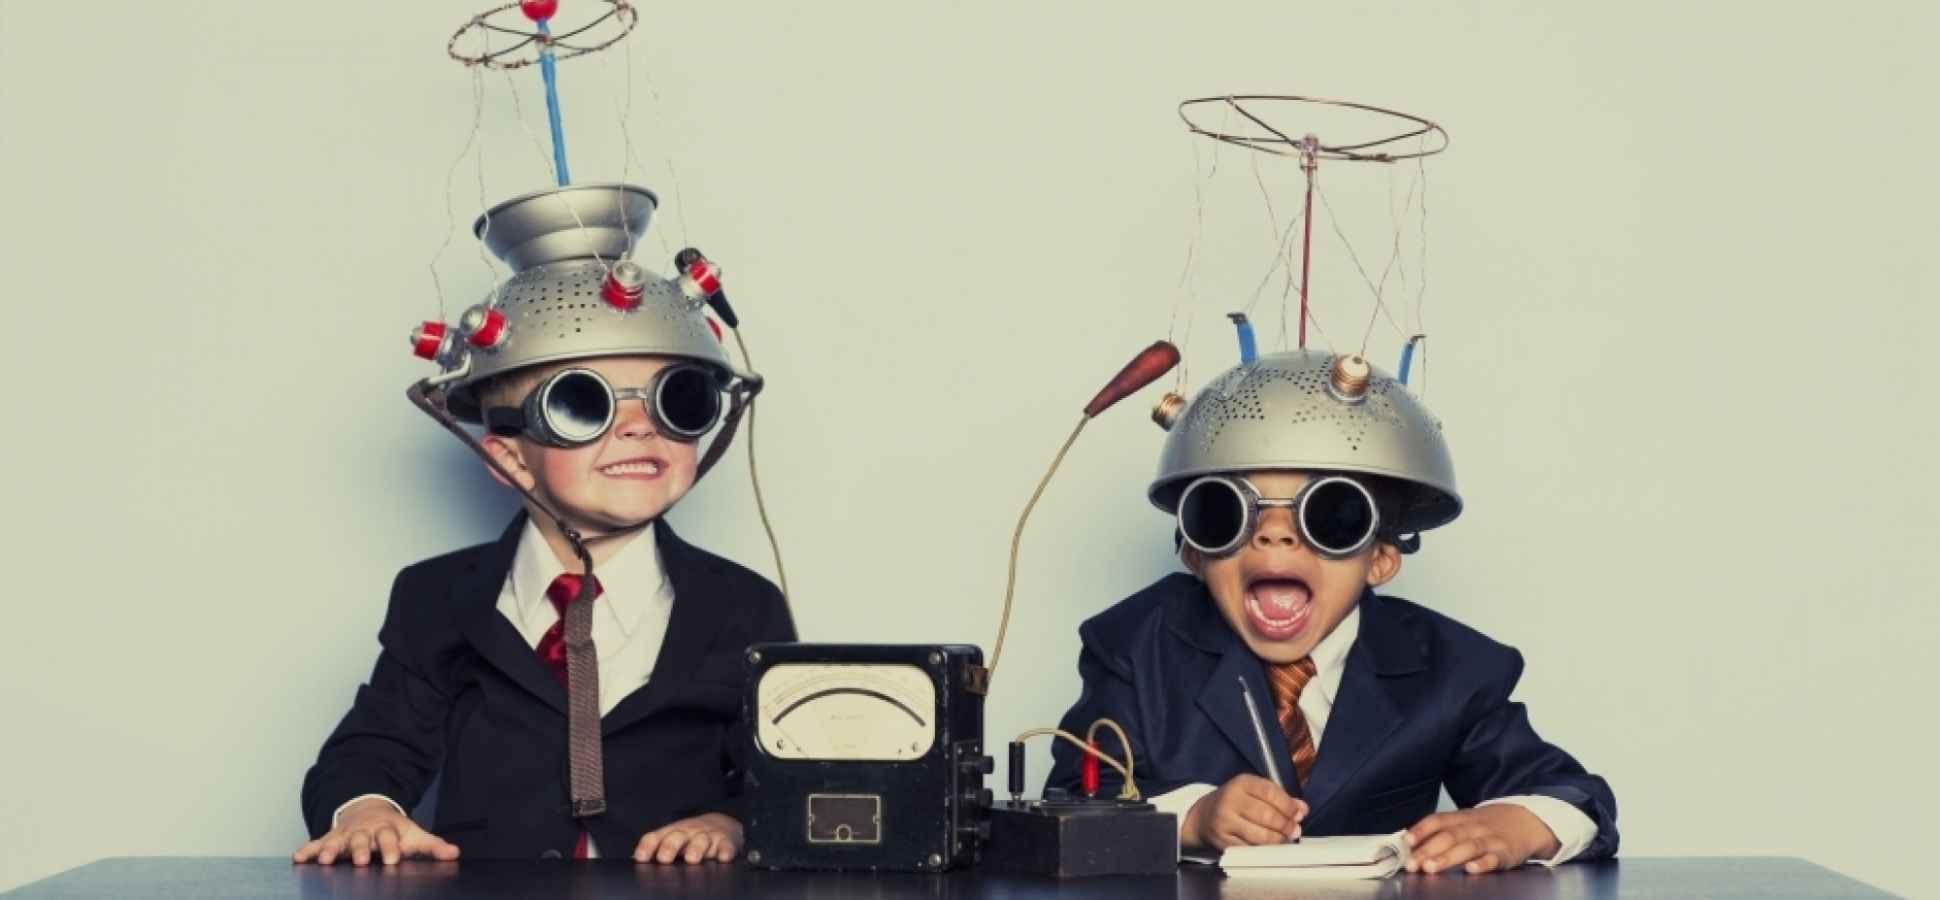 3 Ways to Make Innovation Easier